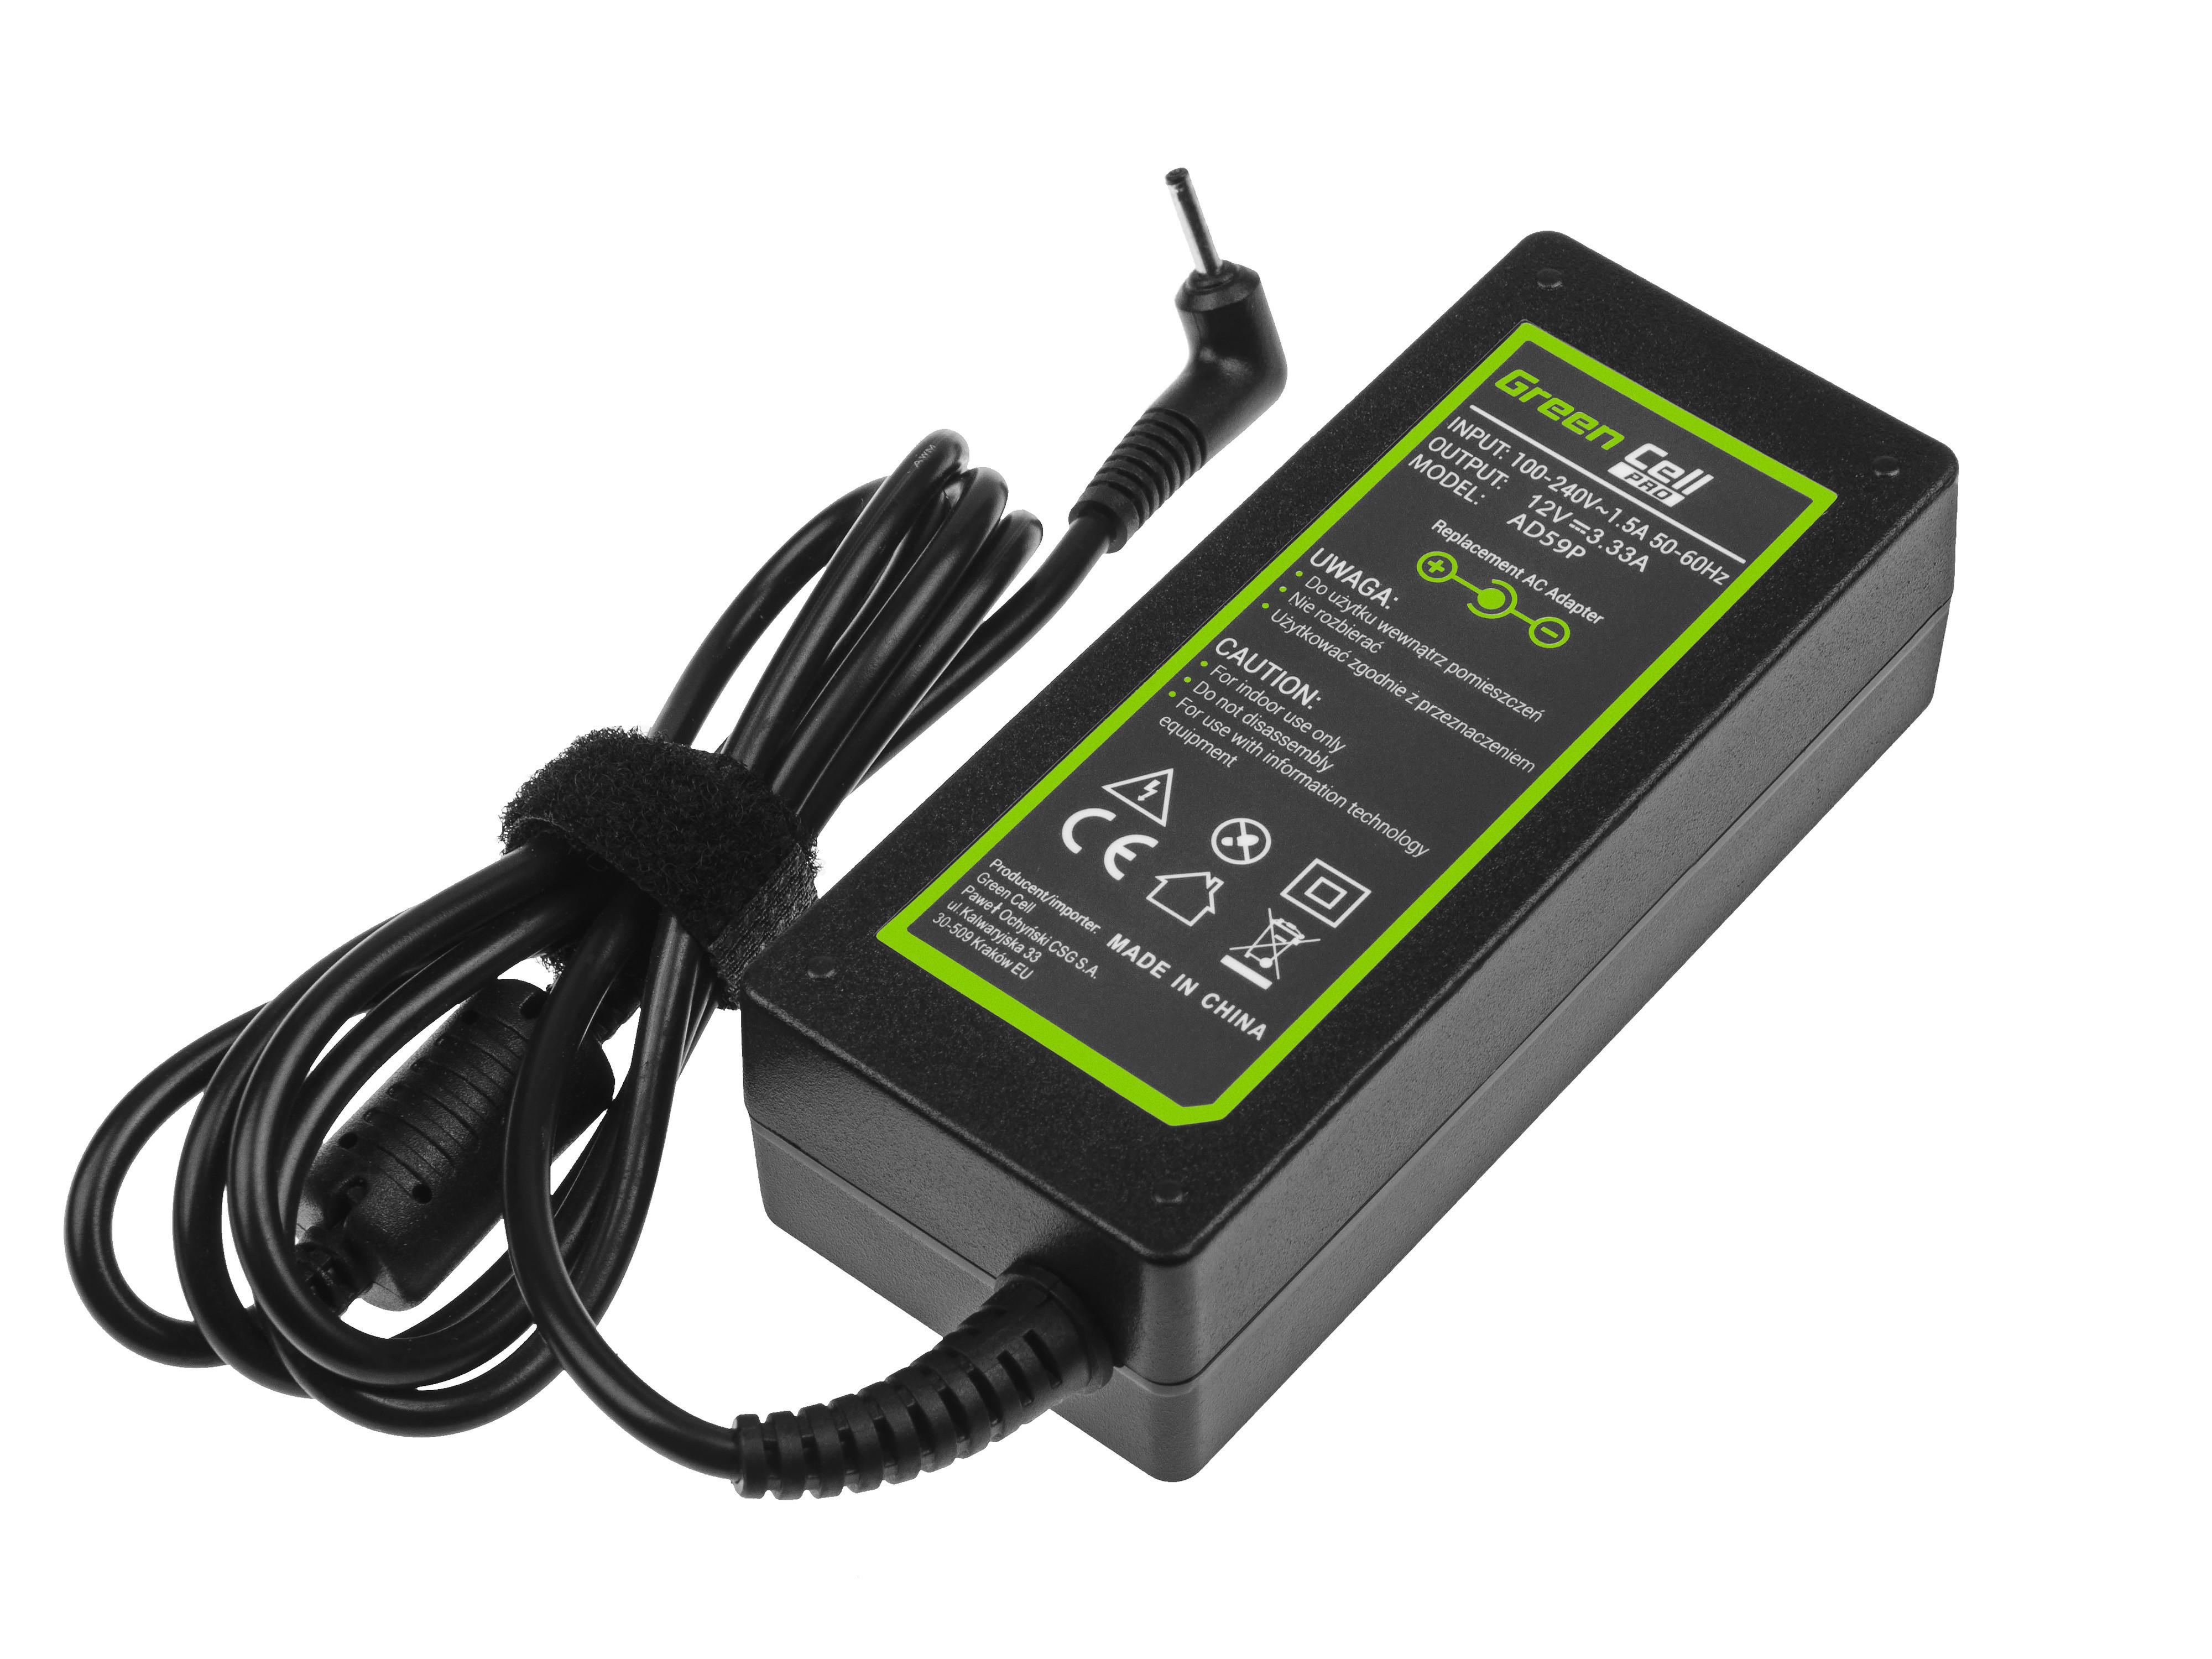 Green Cell AD59P Nabíječka adaptér Samsung 303C XE303C12 500C XE500C13 500T XE500T1C 700T XE700T1C 12V 3,33A 40W